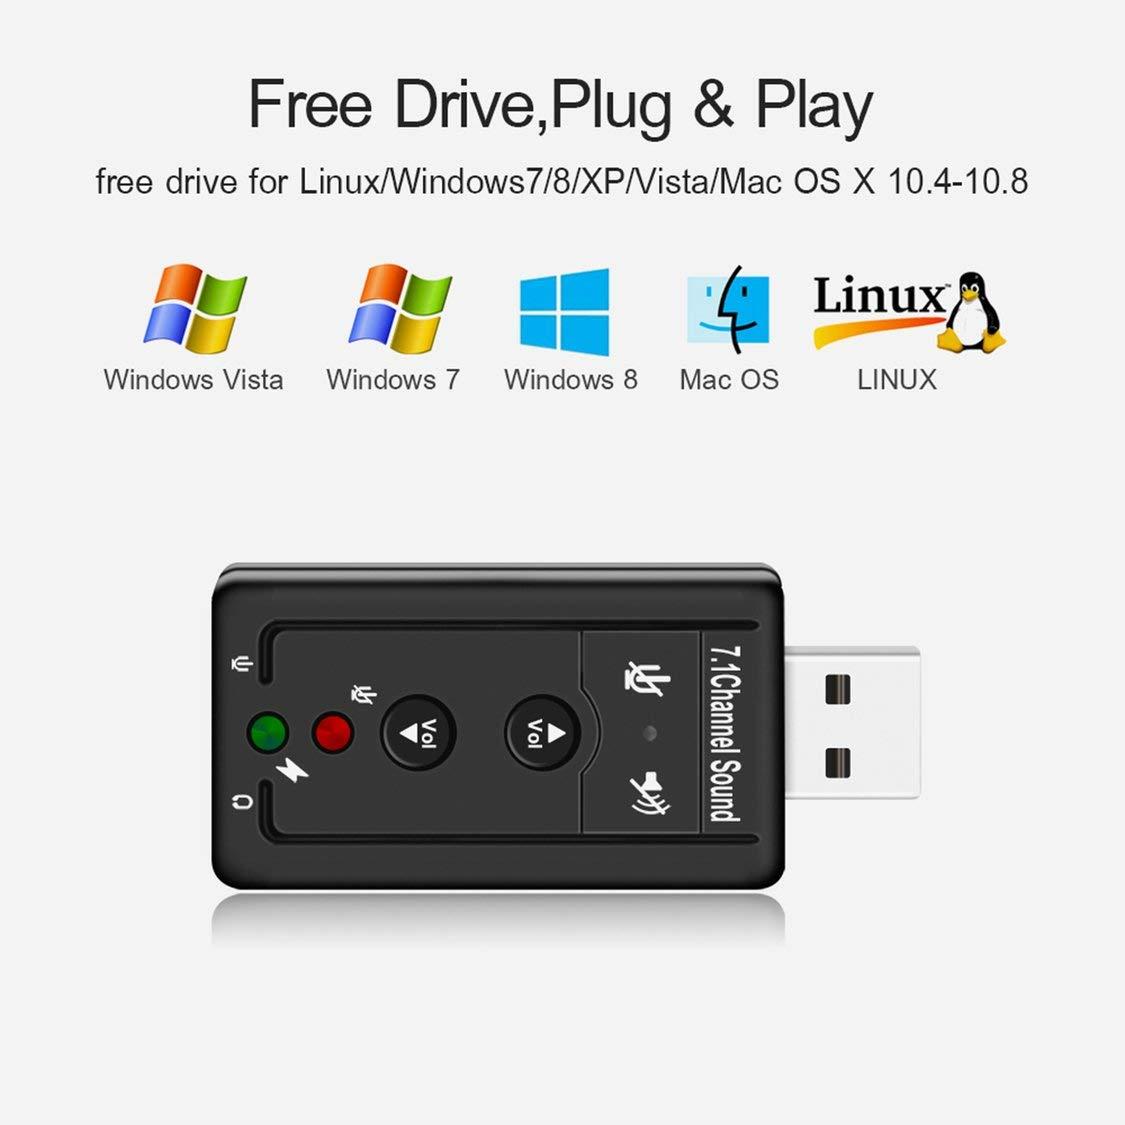 FancyswES8eety USB 2.0 Tarjeta de Sonido Externa 7.1CH Audio Mini Adaptador con Control de bot/ón 3.5mm Auricular Mic Interfaz Componentes de la computadora